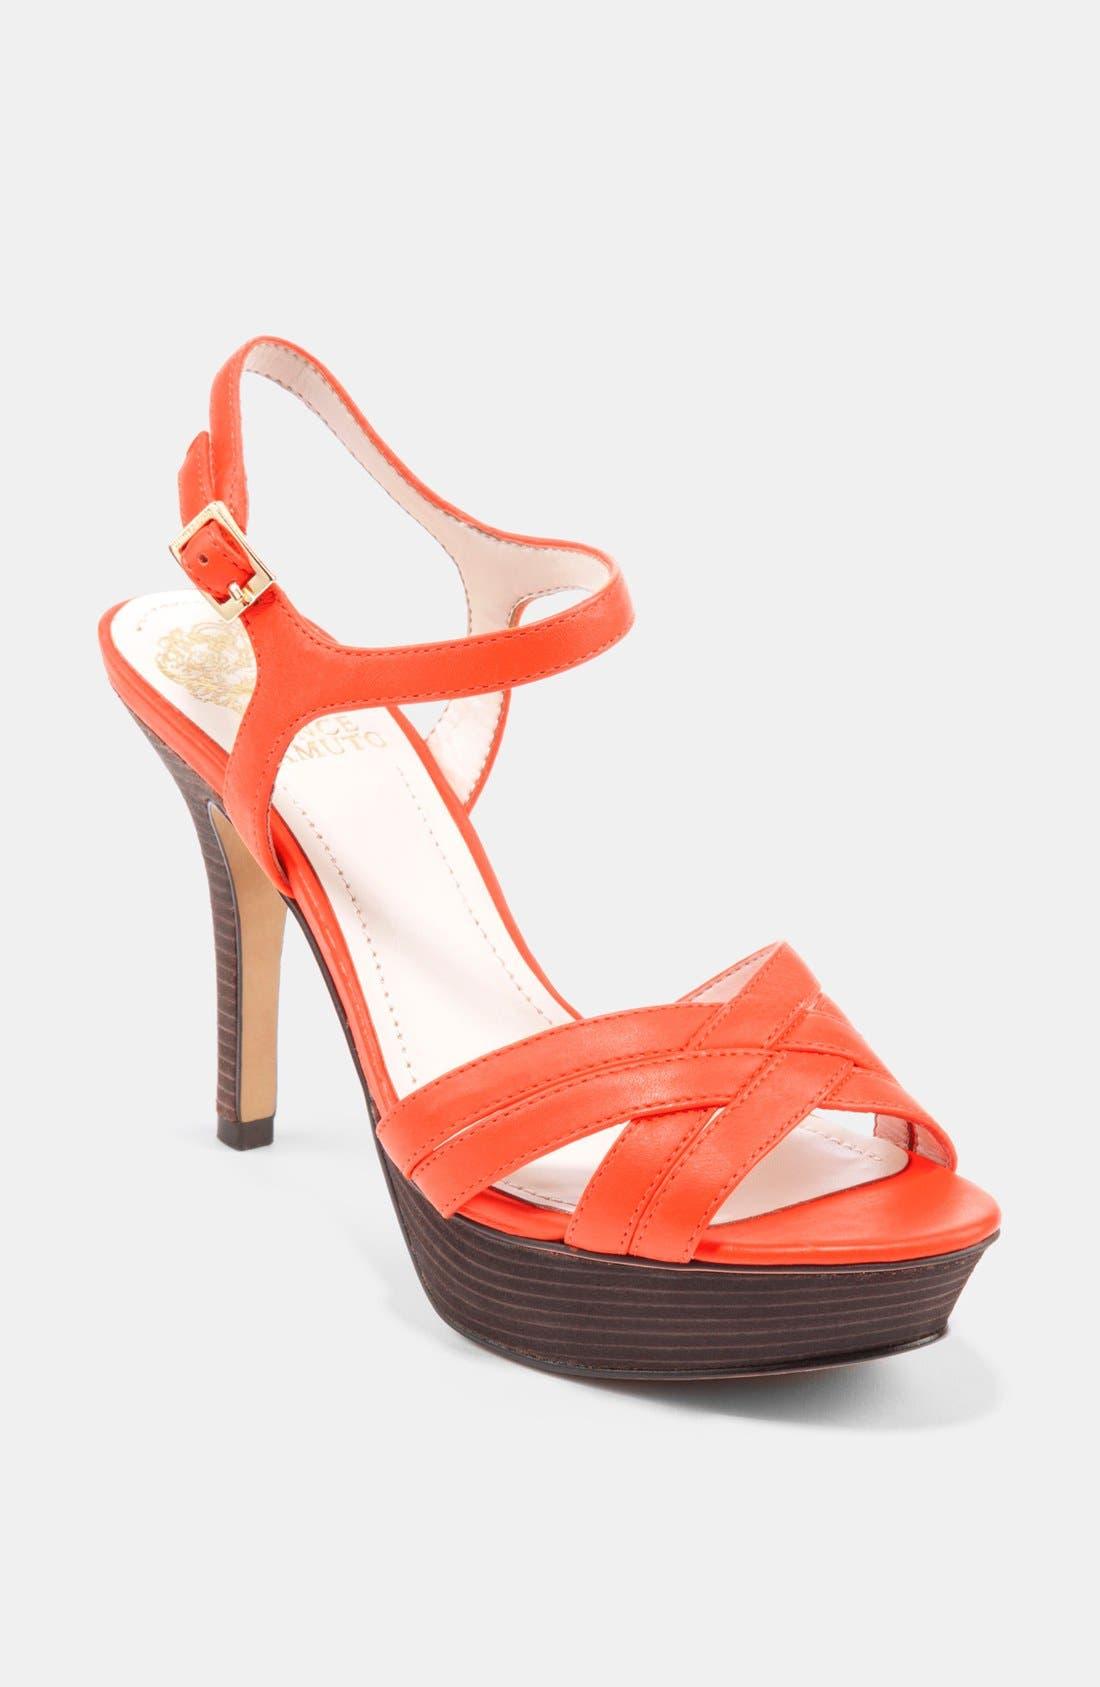 Alternate Image 1 Selected - Vince Camuto 'Paden' Sandal